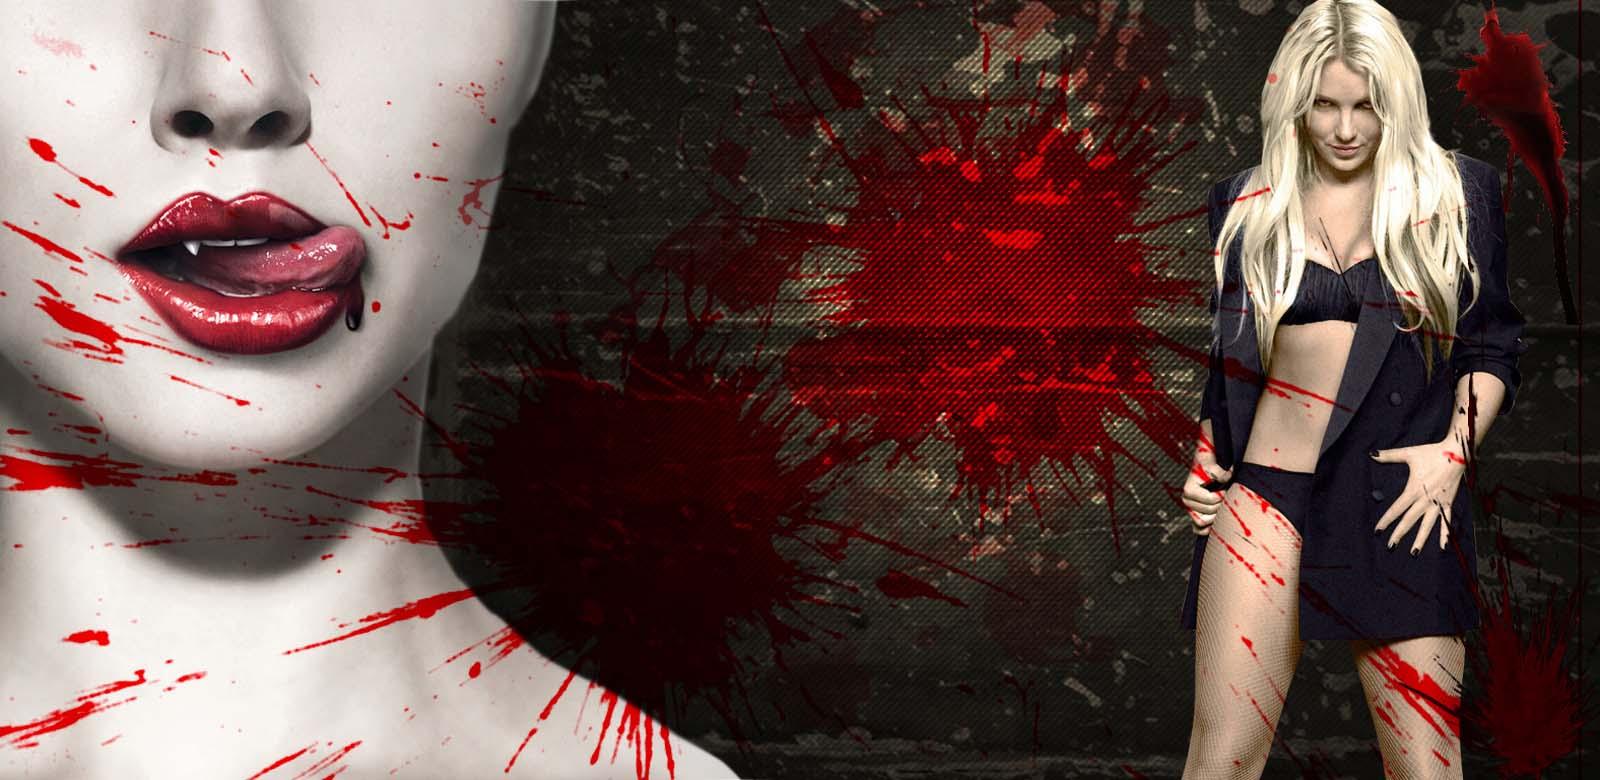 True Blood Wallpaper Hd: True Blood Wallpaper